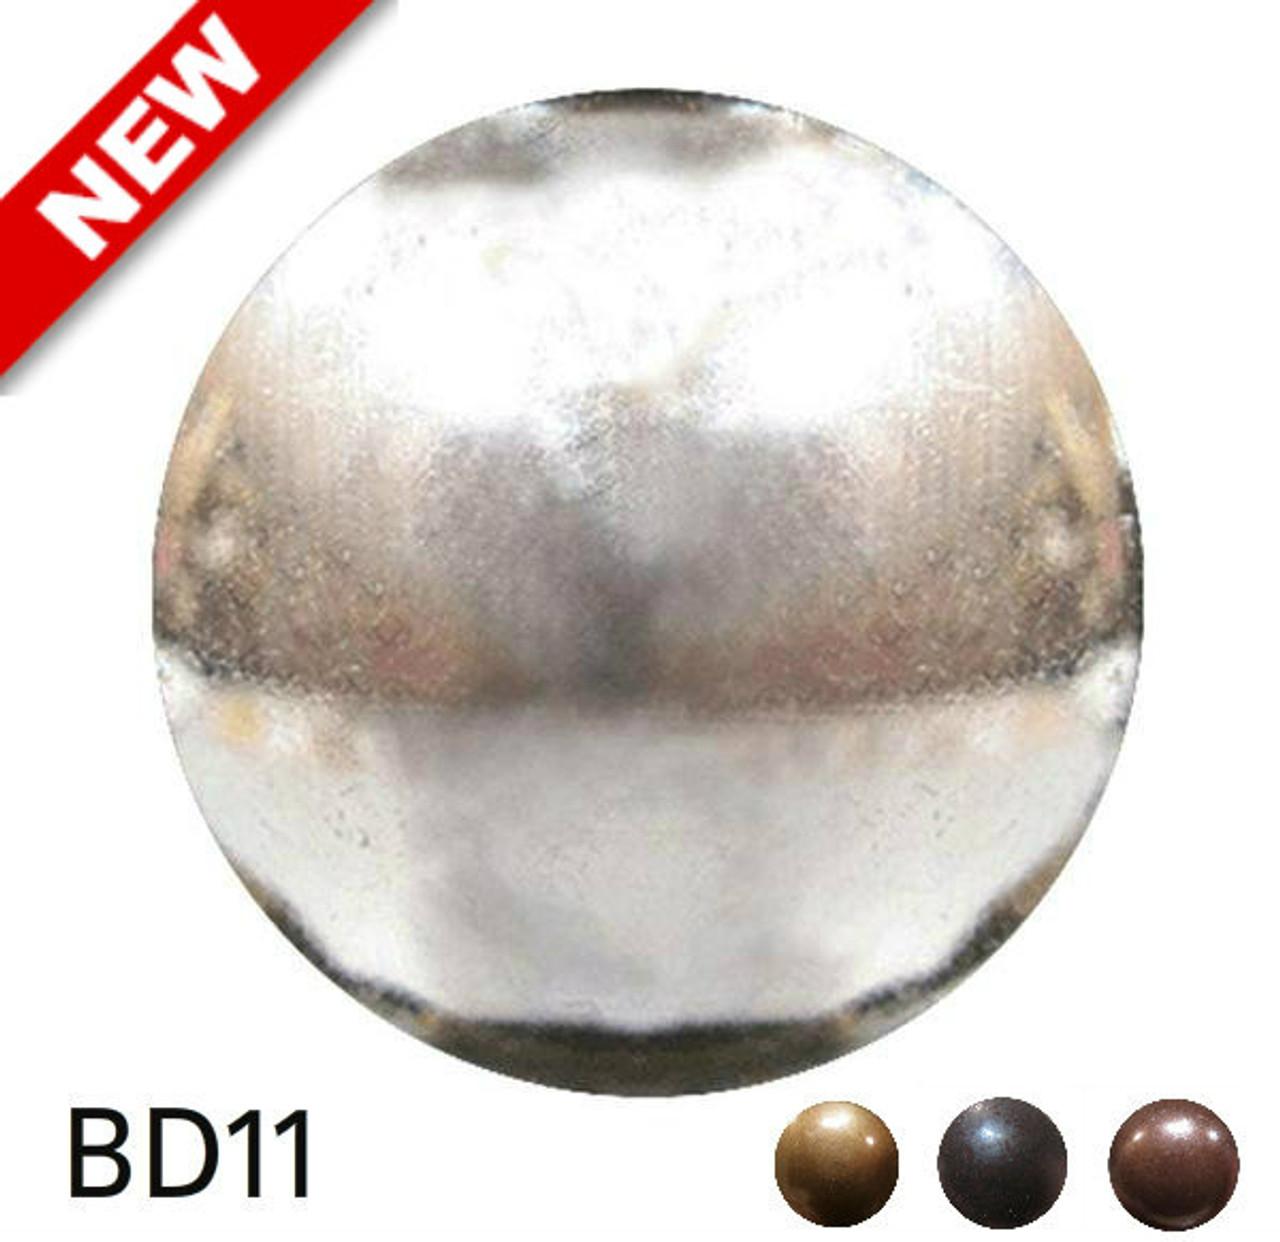 BD11 - High Dome Nail - Head Size:3/8\